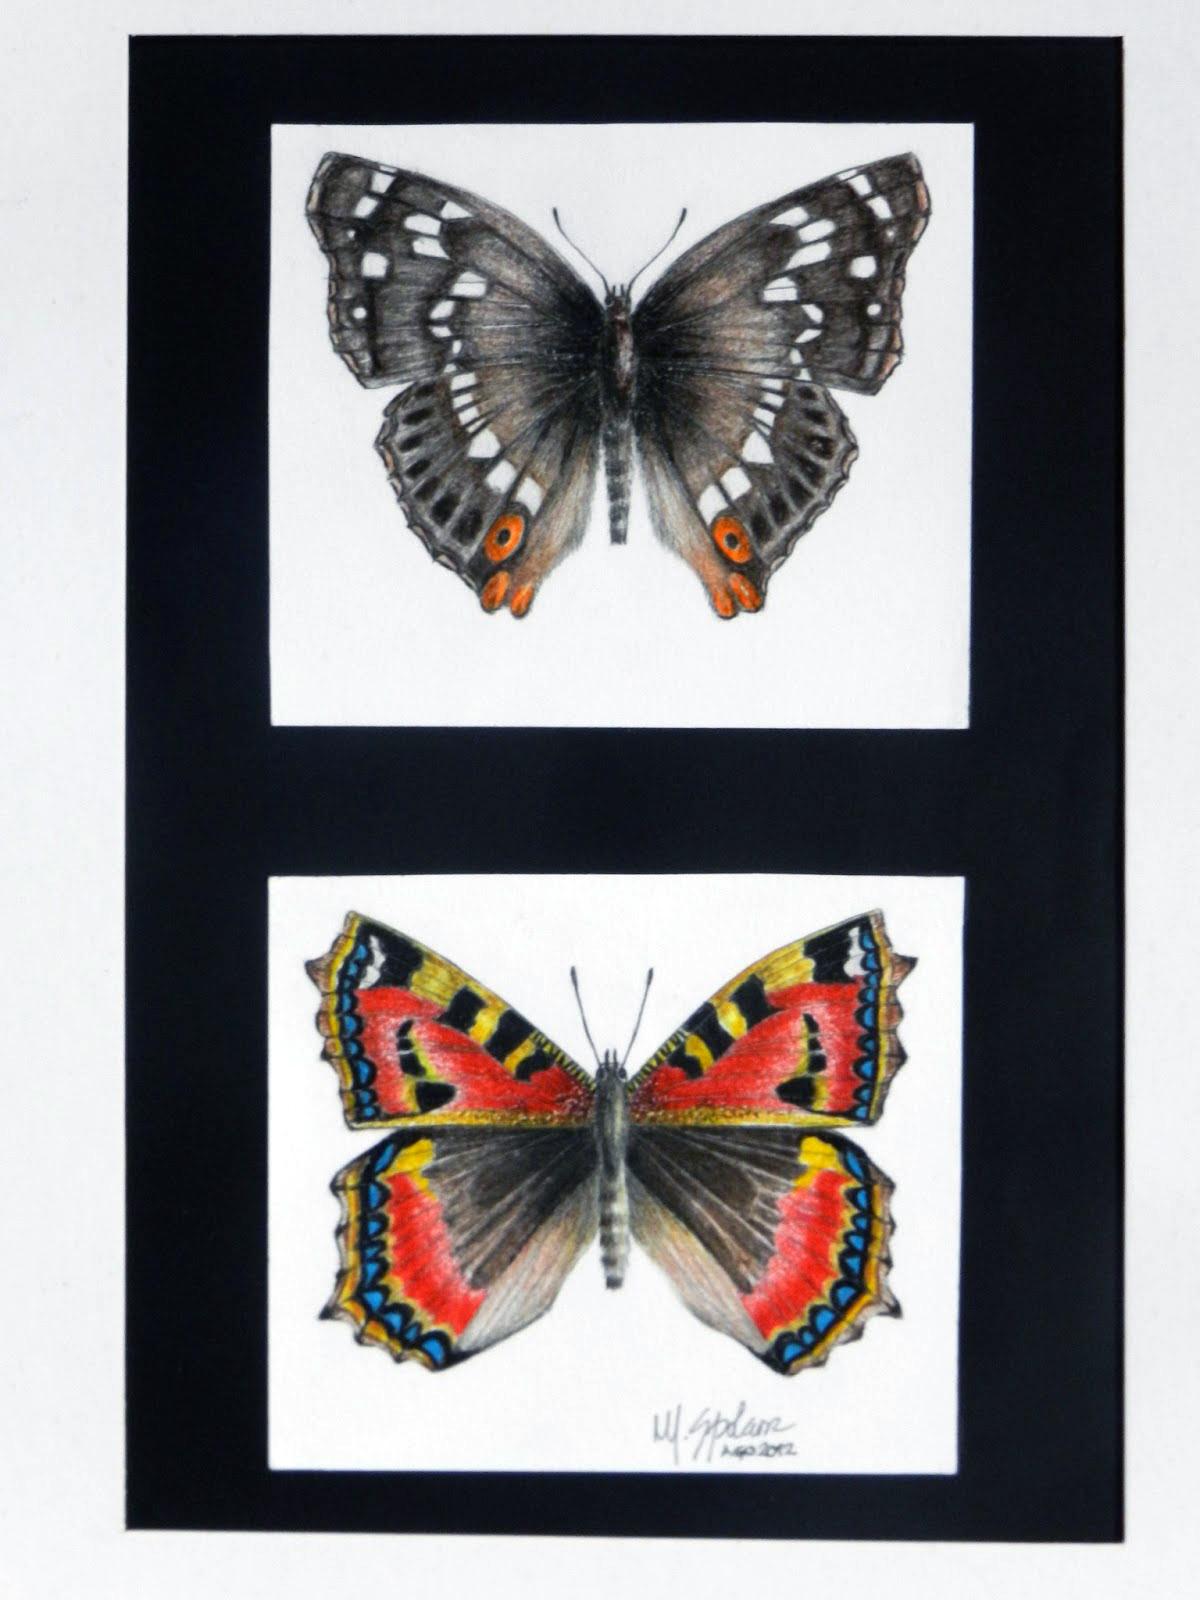 2 borboletas gigantes